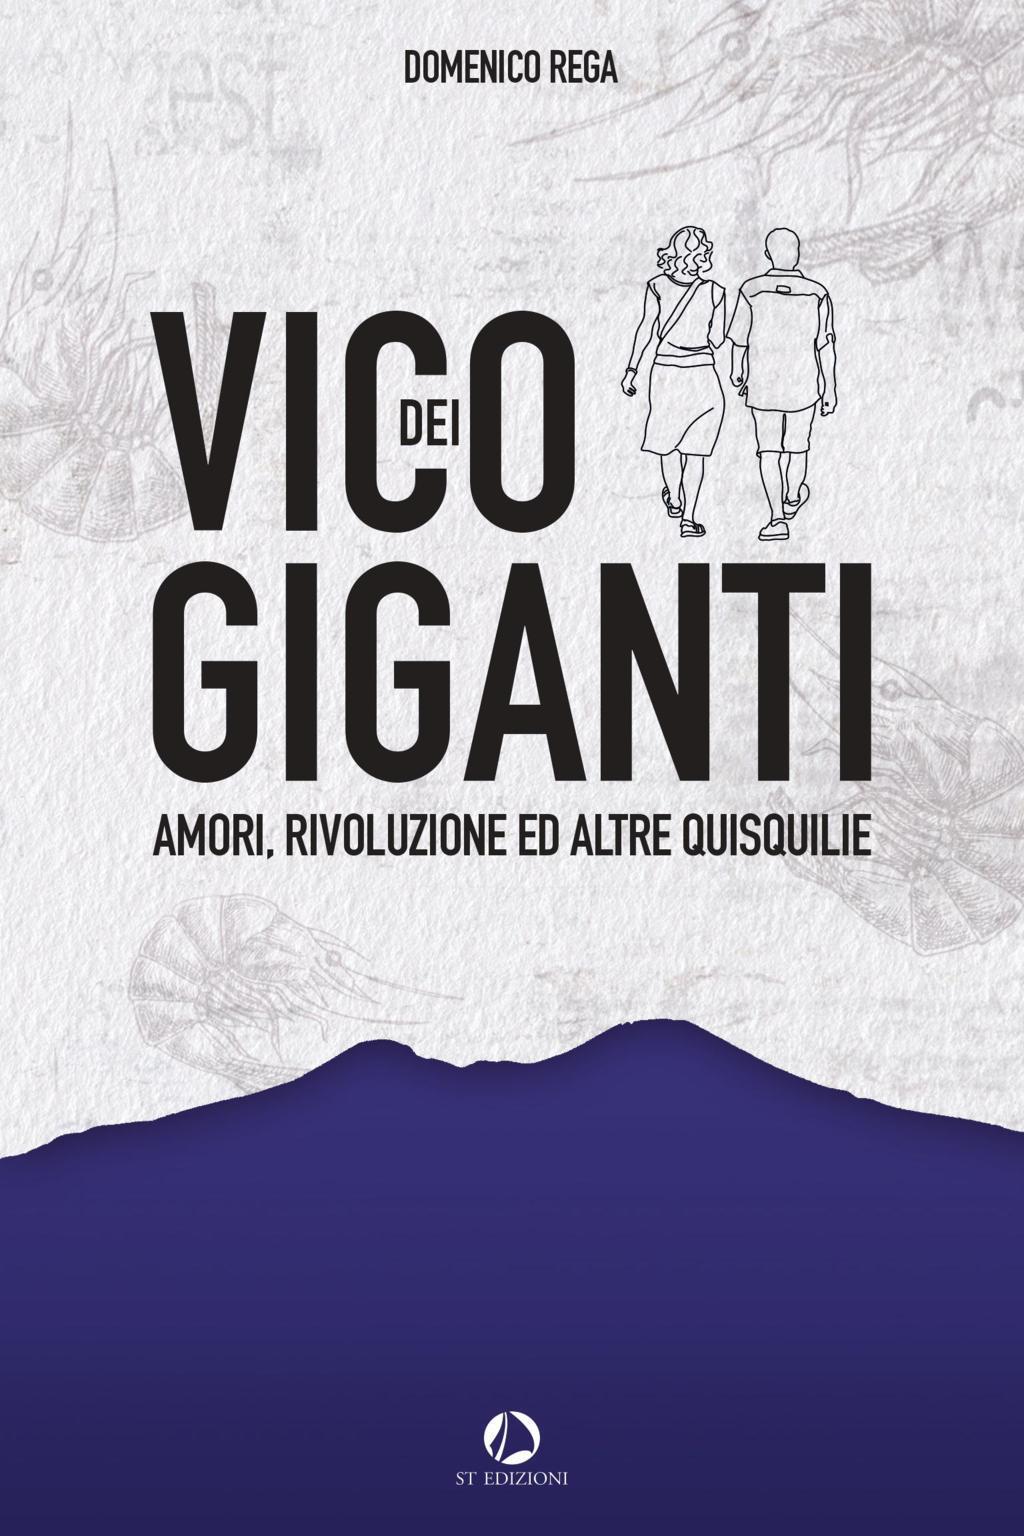 Domenico Rega - Vico dei Giganti